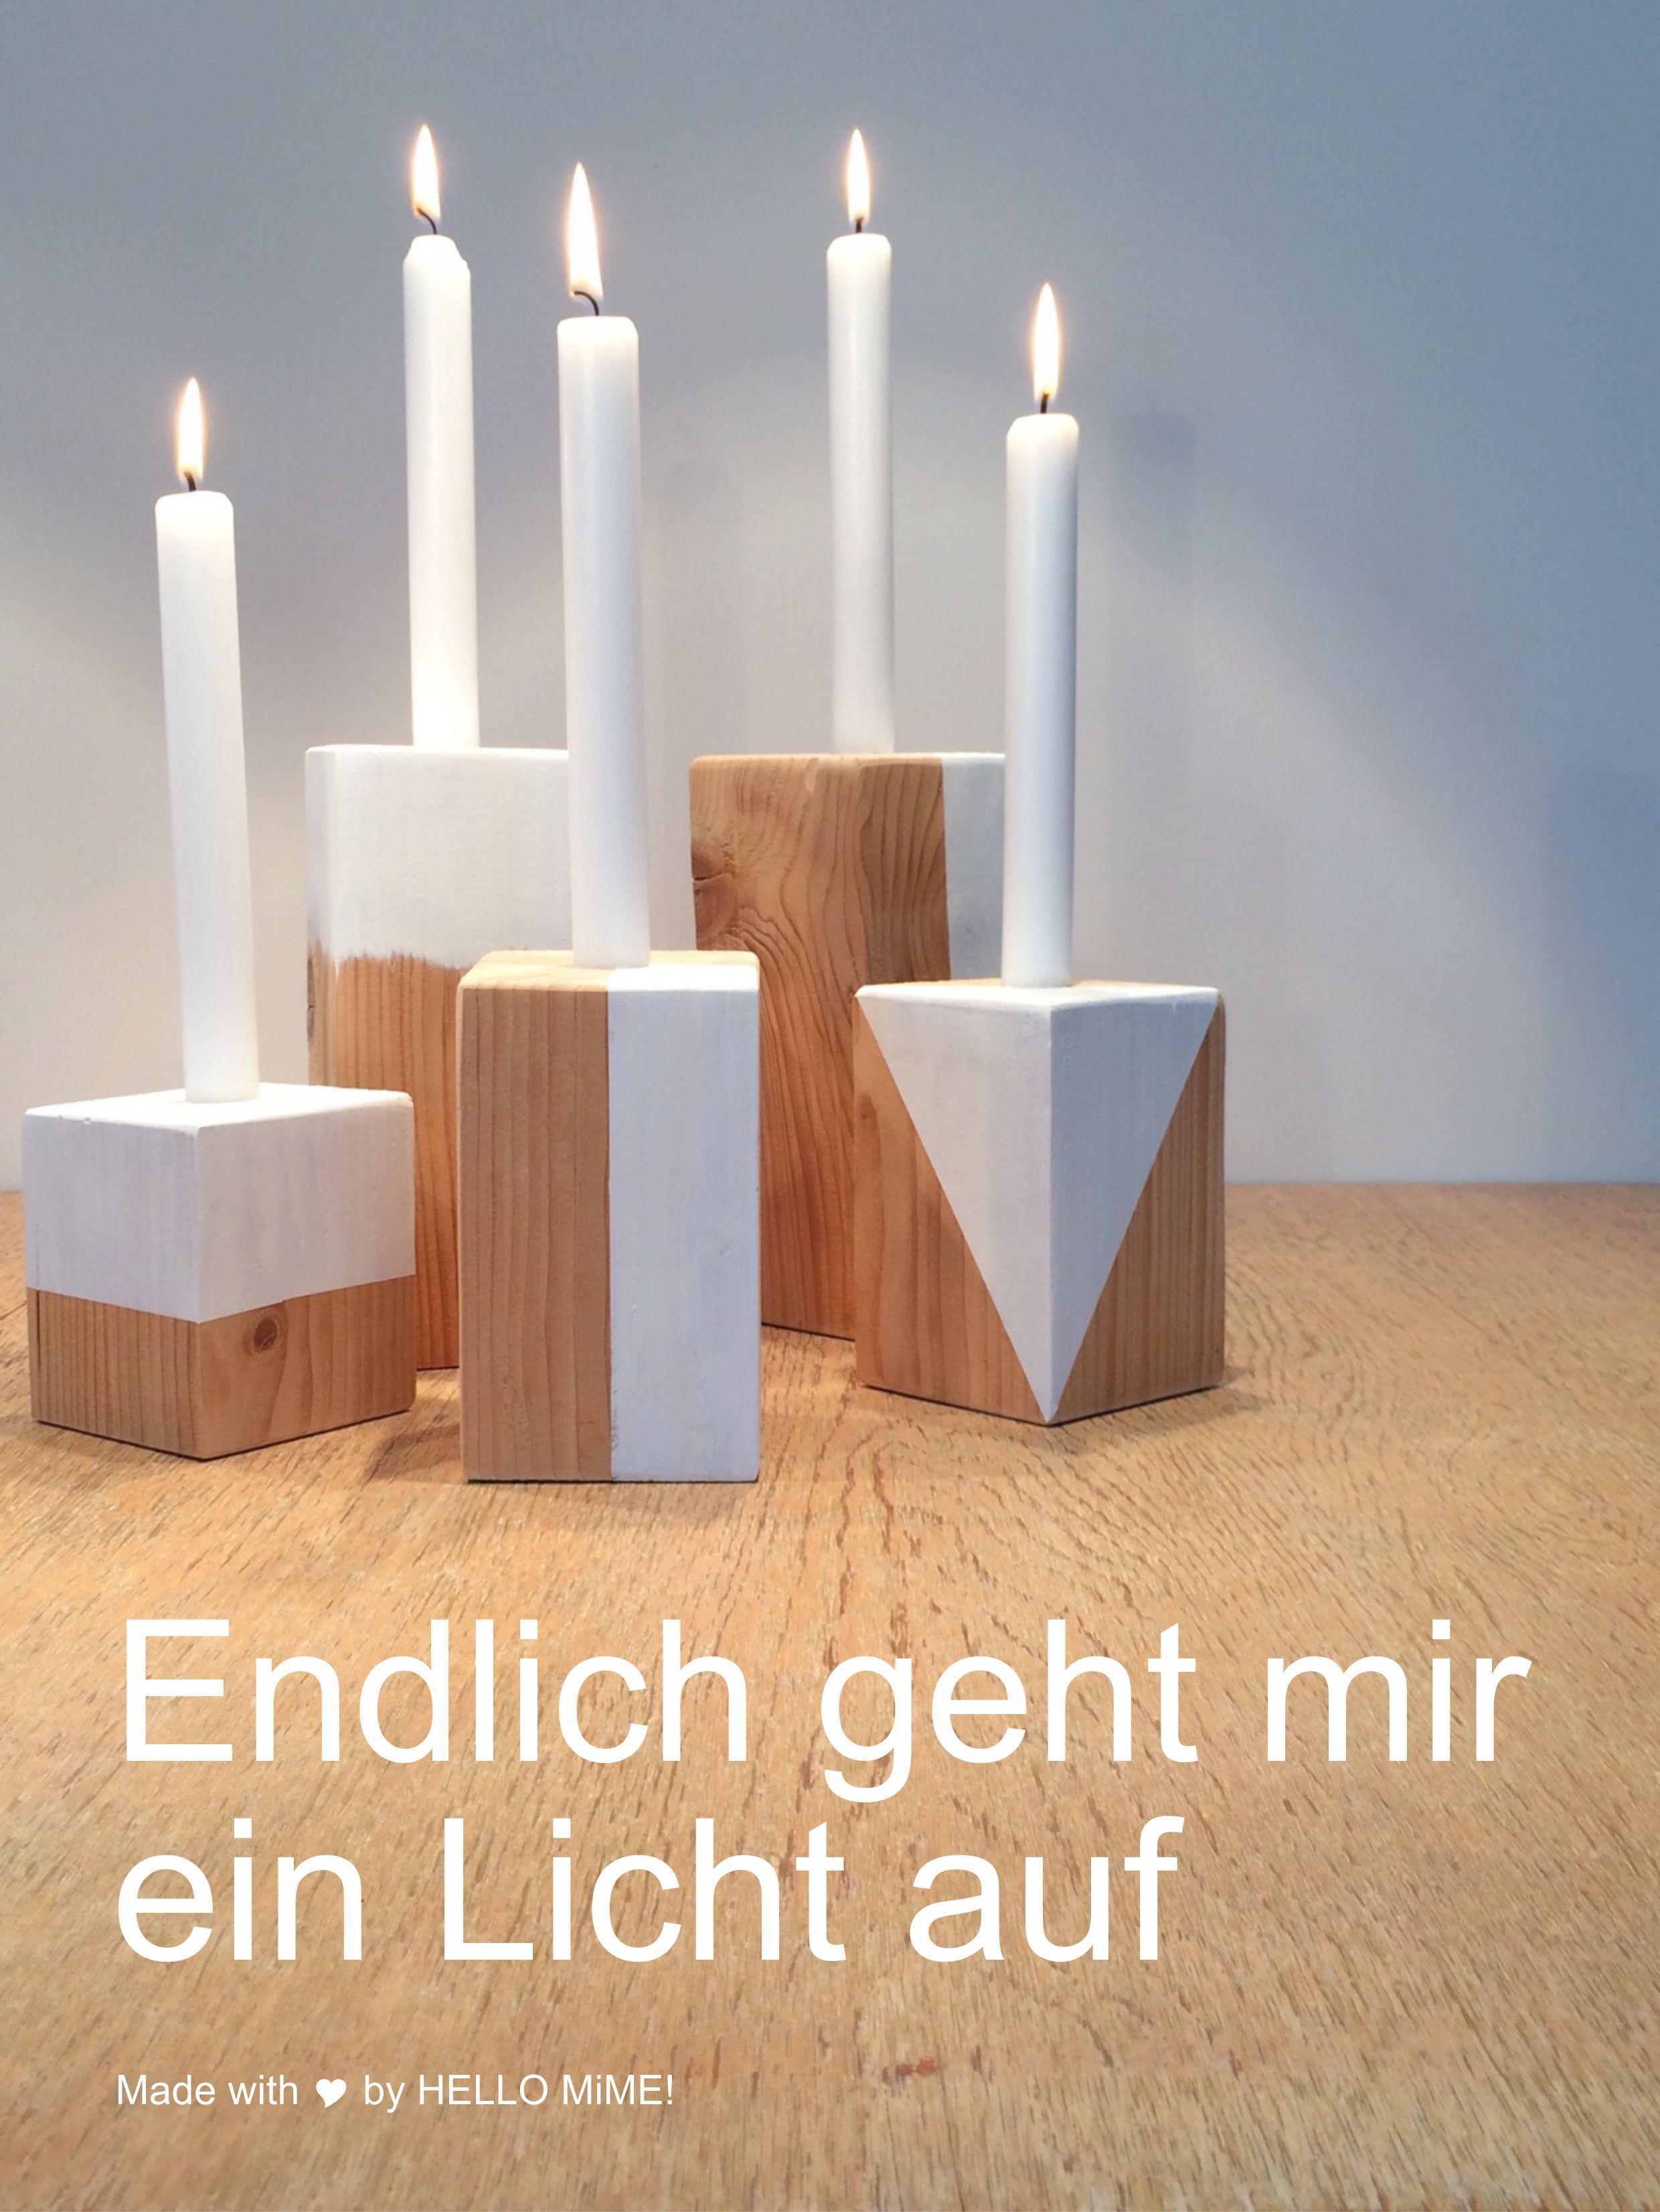 Kerzenstander Holz Diy Diy Idea Decoration Candle Holder Kerzenstander Holz Kerzenhalter Holz Kronleuchter Selbst Bauen